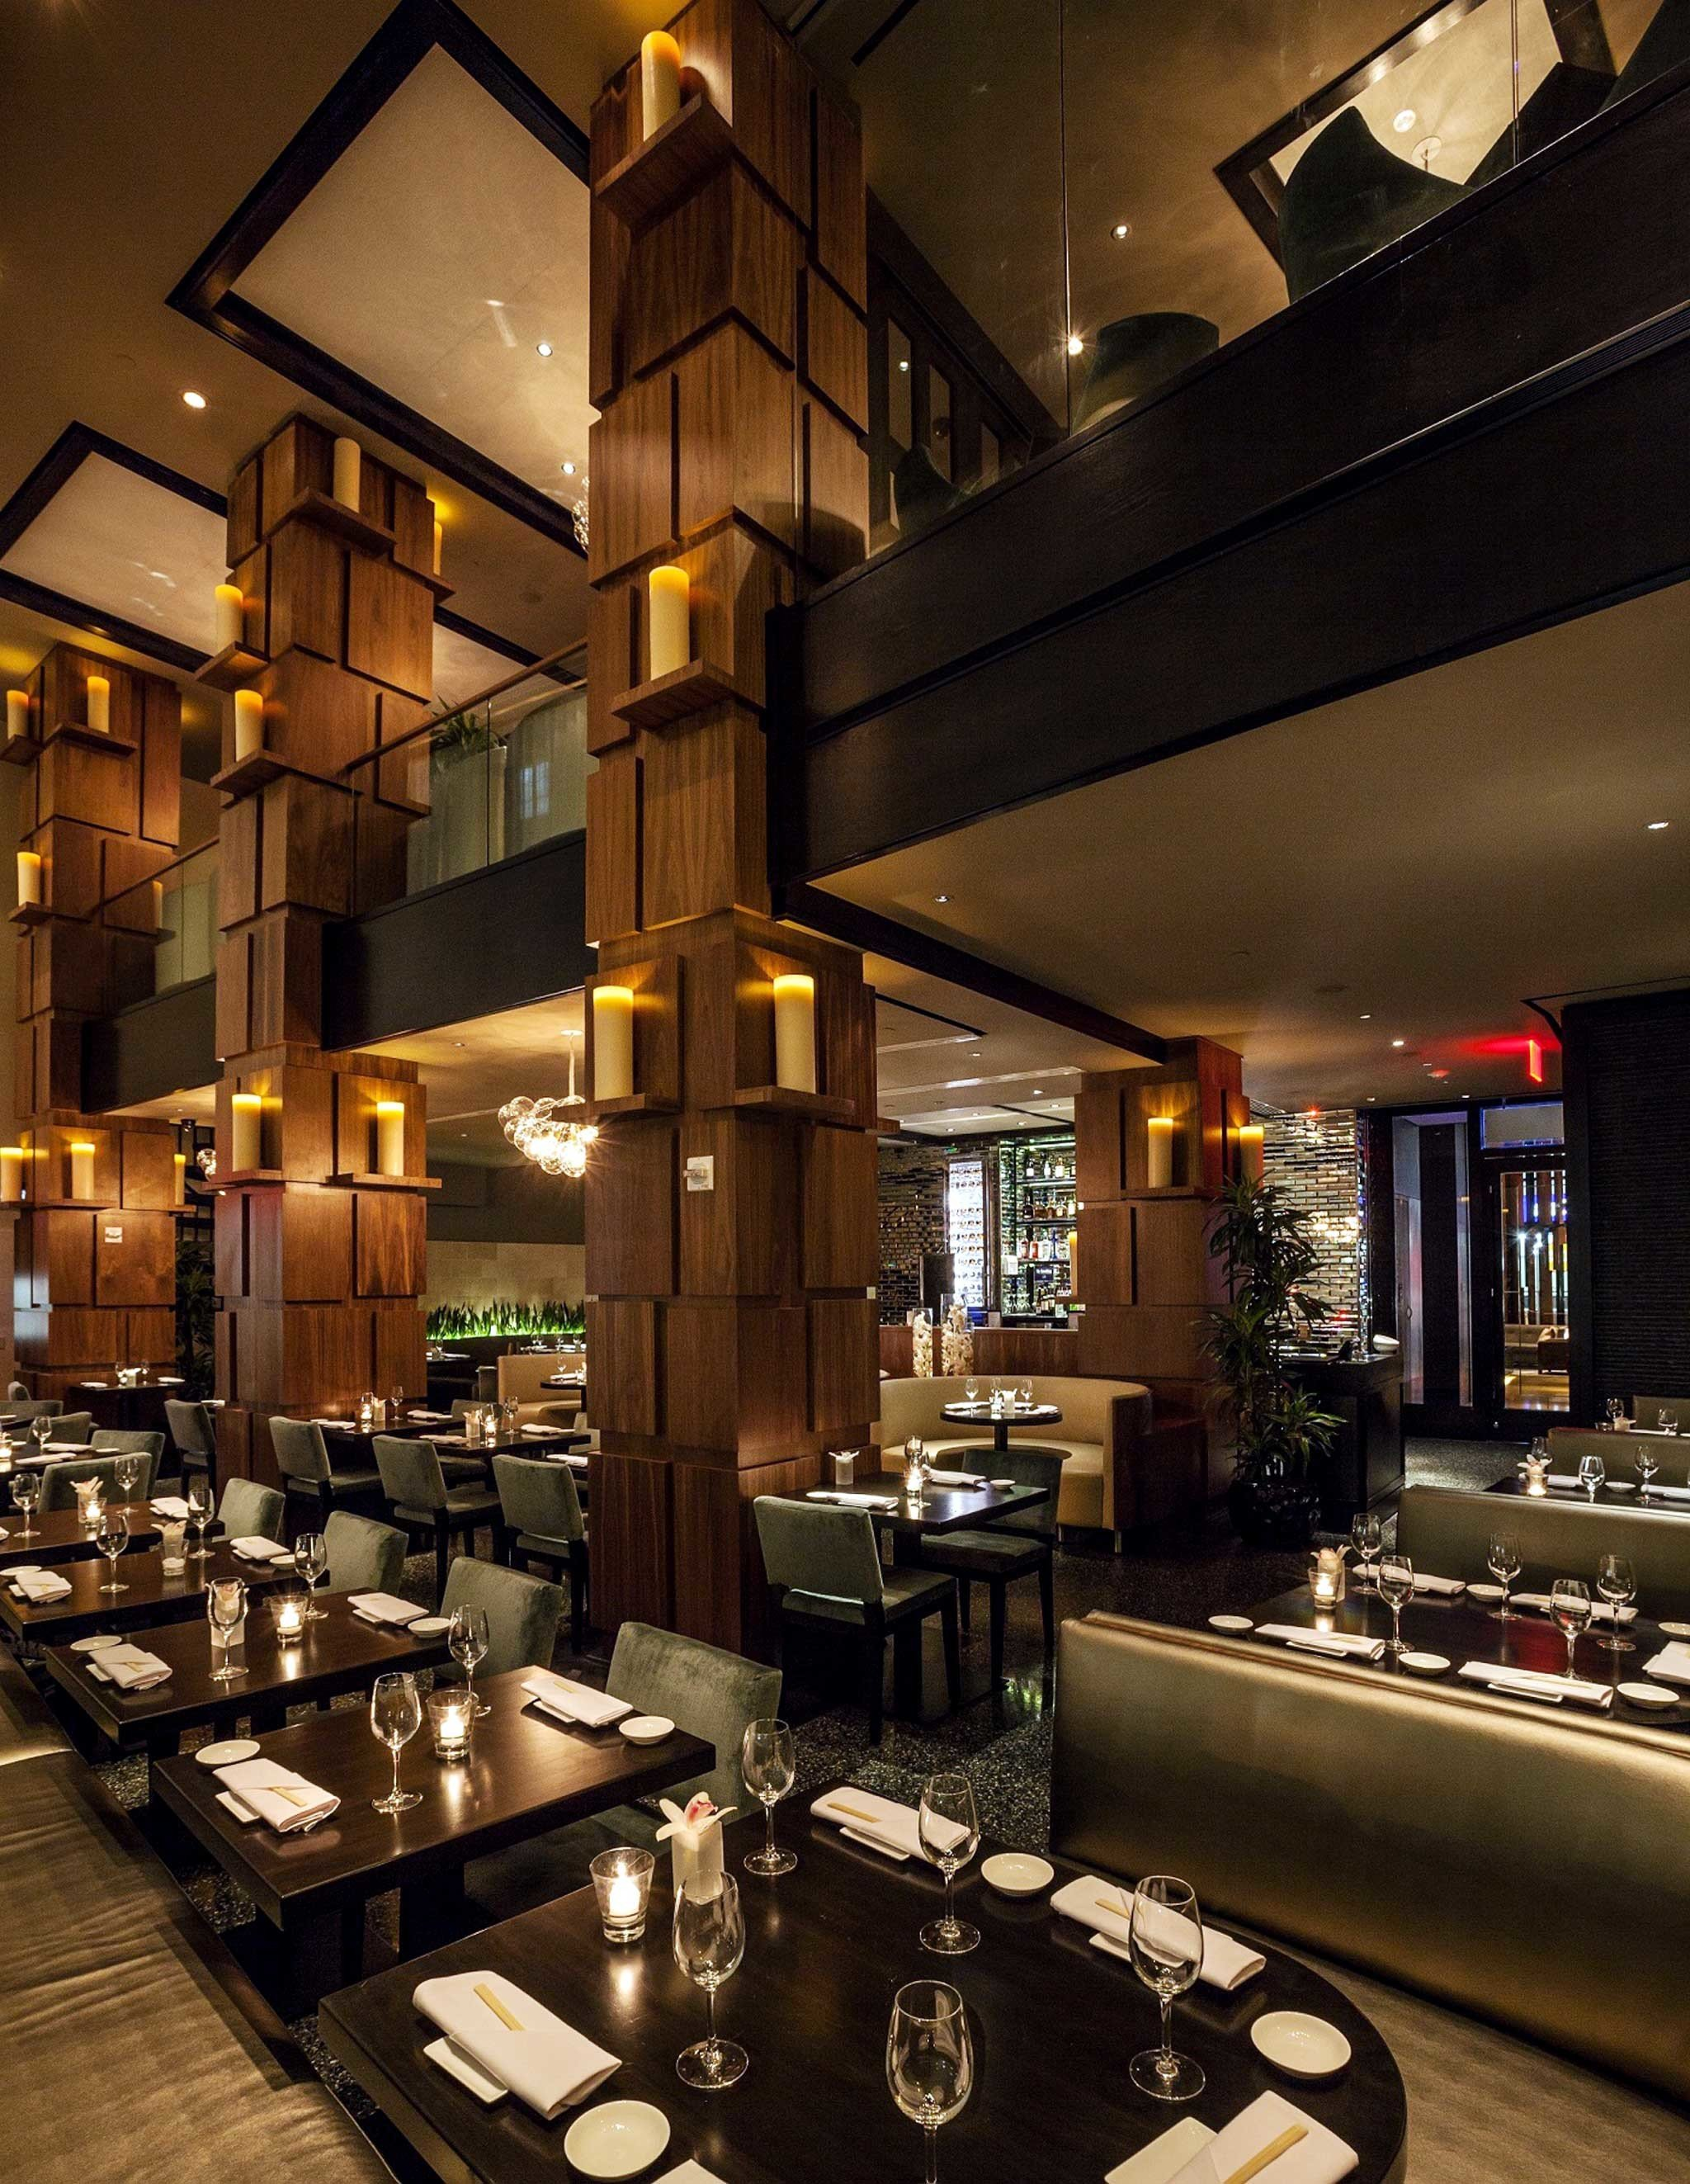 City Dining Drink Eat Elegant Luxury restaurant Lobby café Bar lighting